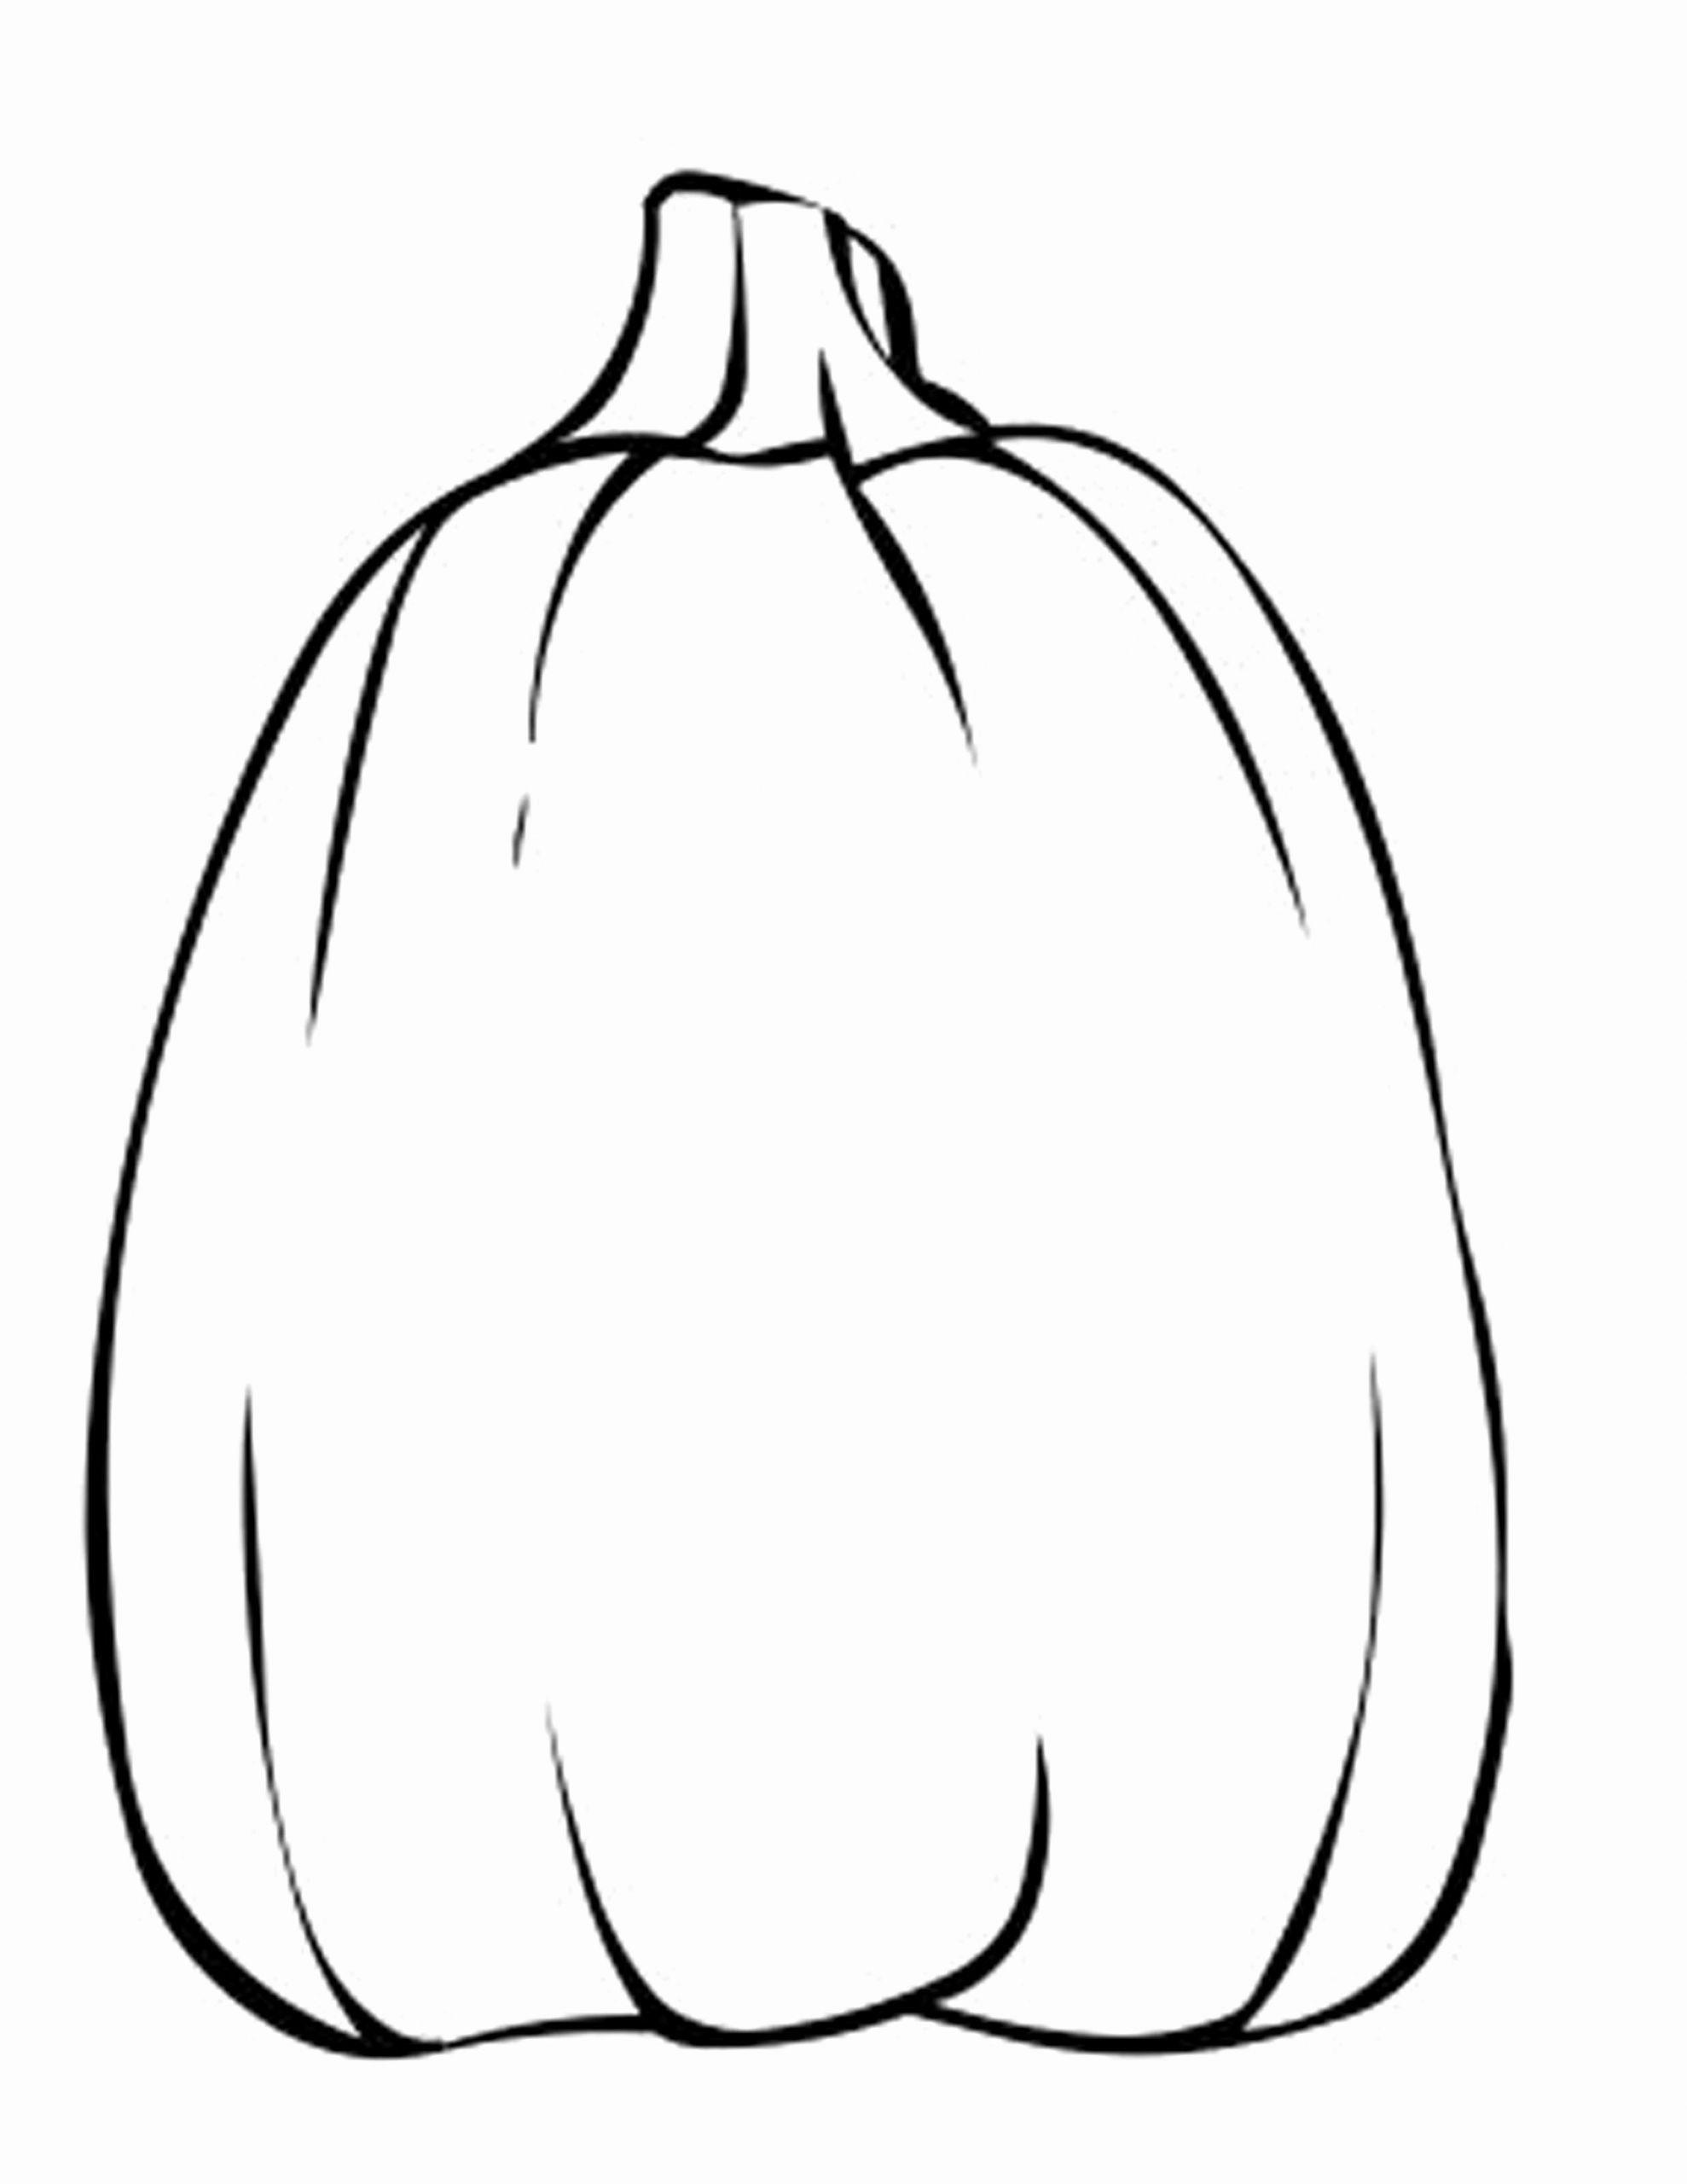 Pumpkin Coloring Sheet Blank Designs Trend